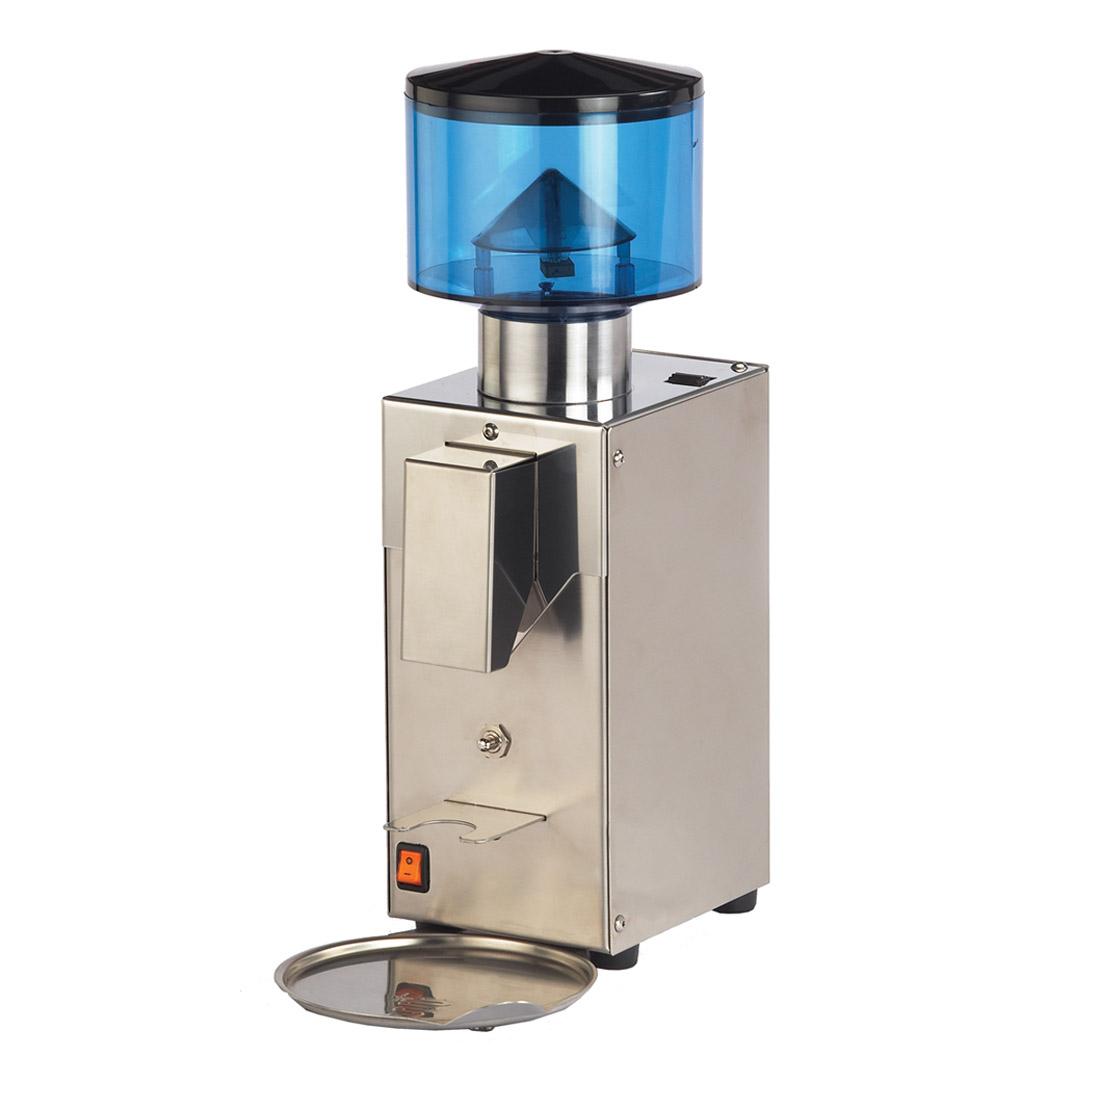 BZBB005M Semi-Automatic Doserless Grinder